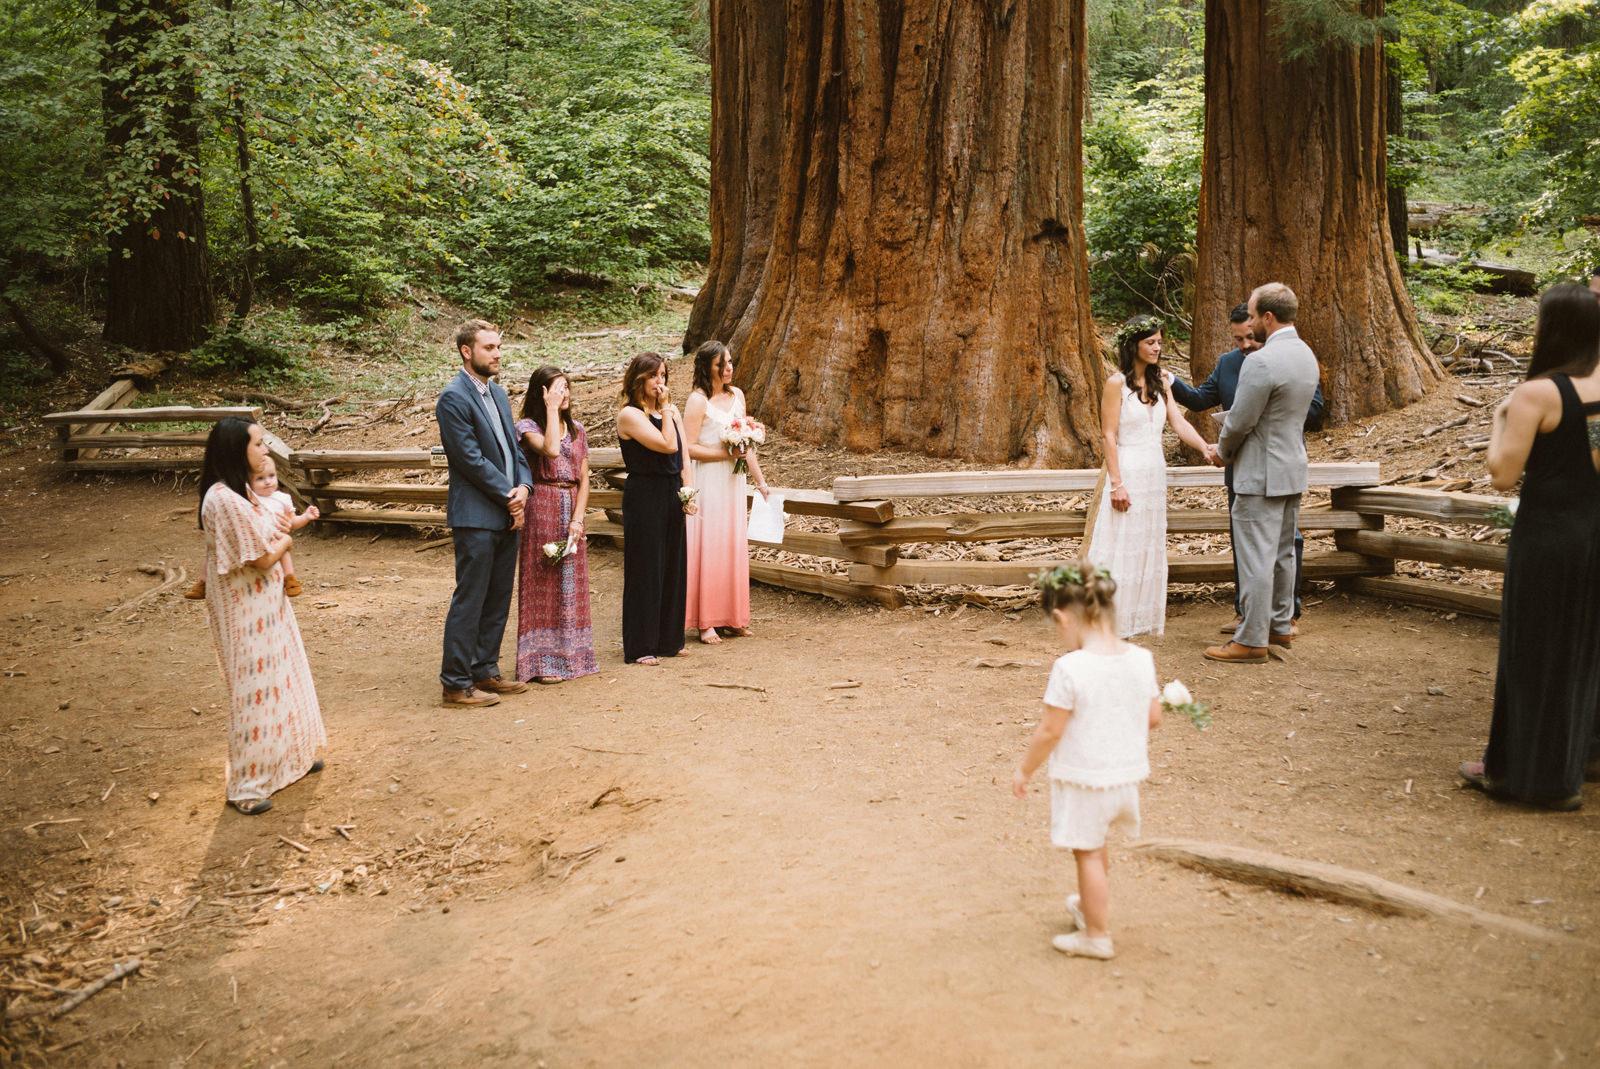 yosemite-intimate-wedding-059 YOSEMITE INTIMATE WEDDING